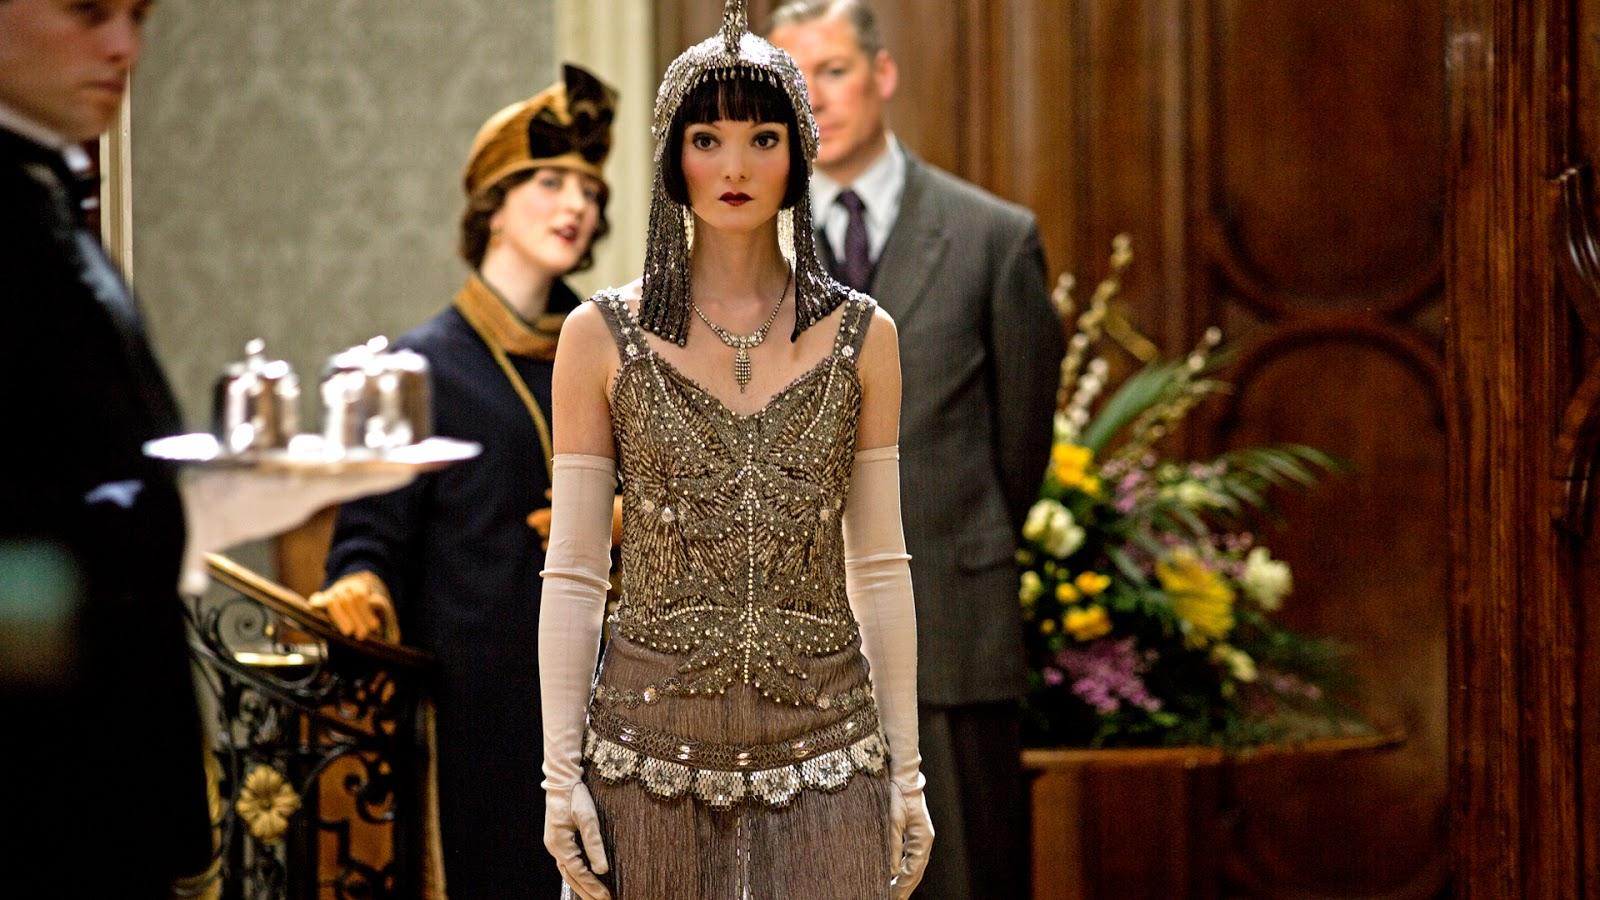 Downton abbey 20 s fashion show by anna mary scott robbins time warp